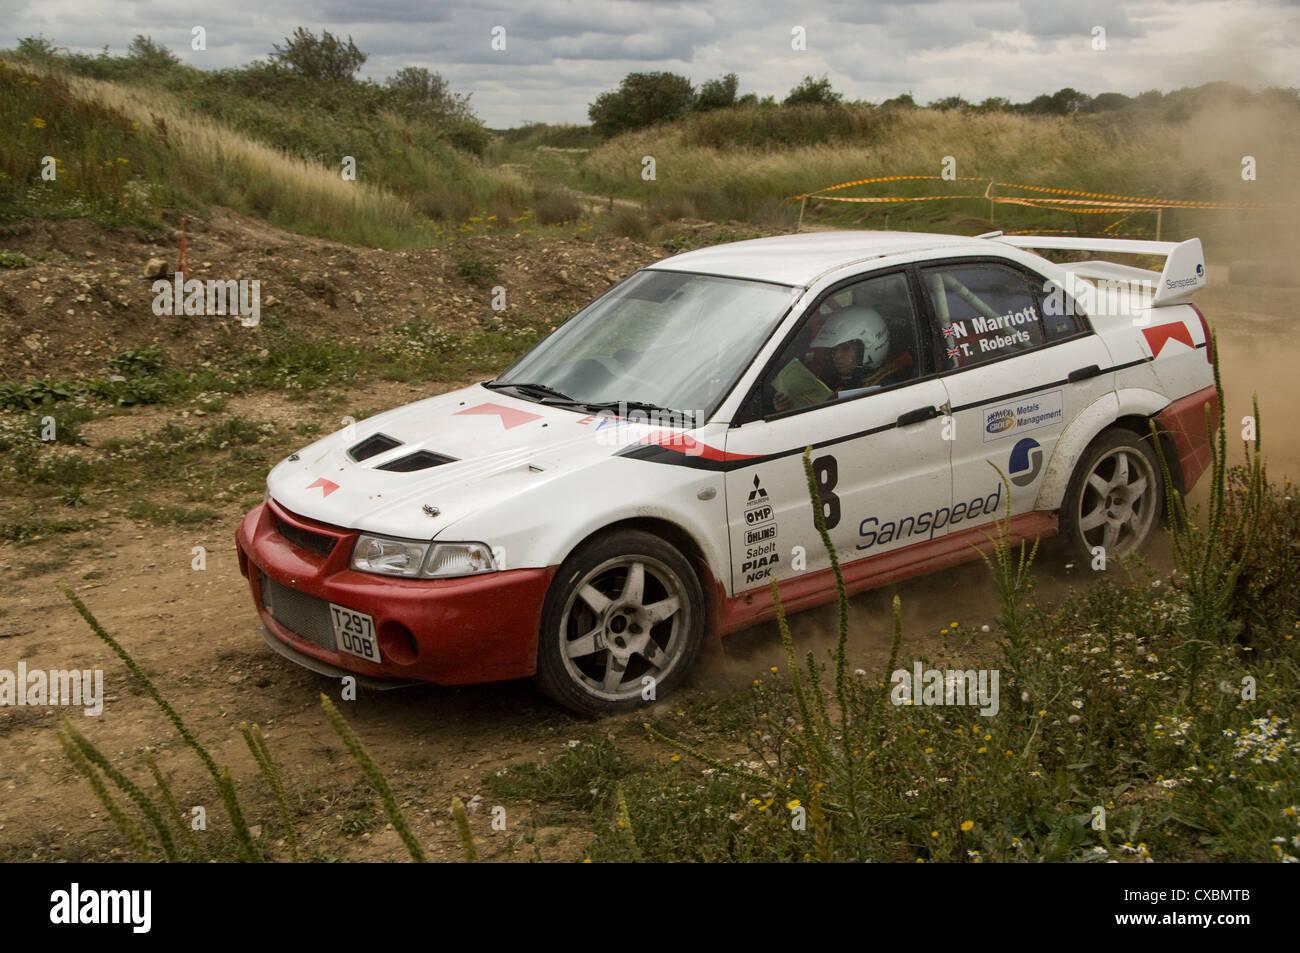 MItsubishi Lancer rally car Stock Photo, Royalty Free Image ...